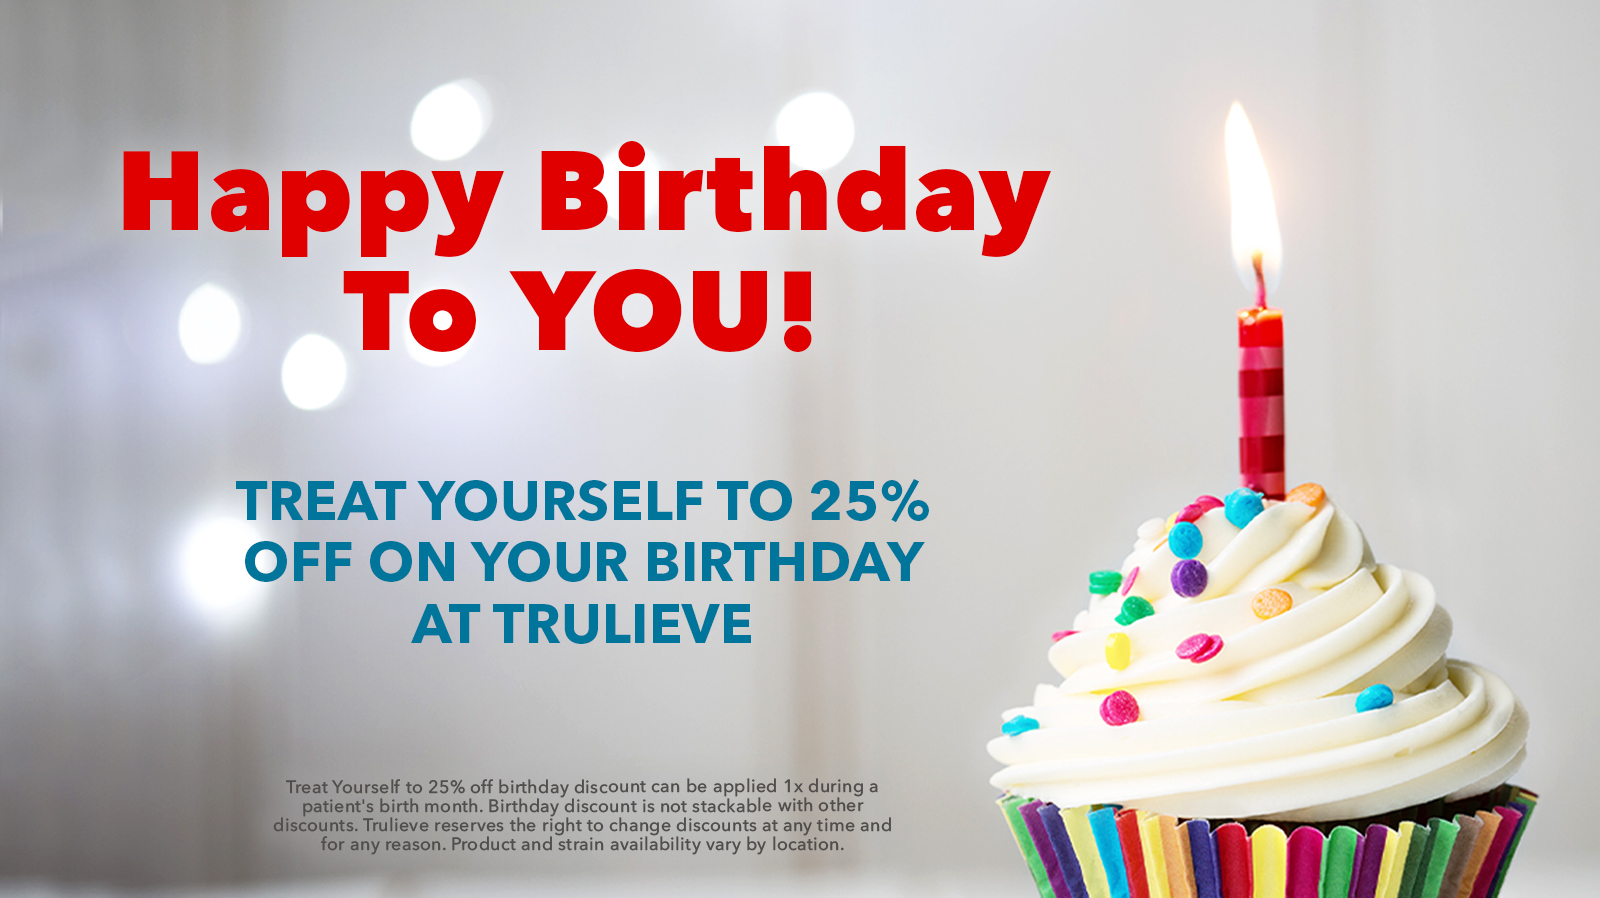 Birthday discount